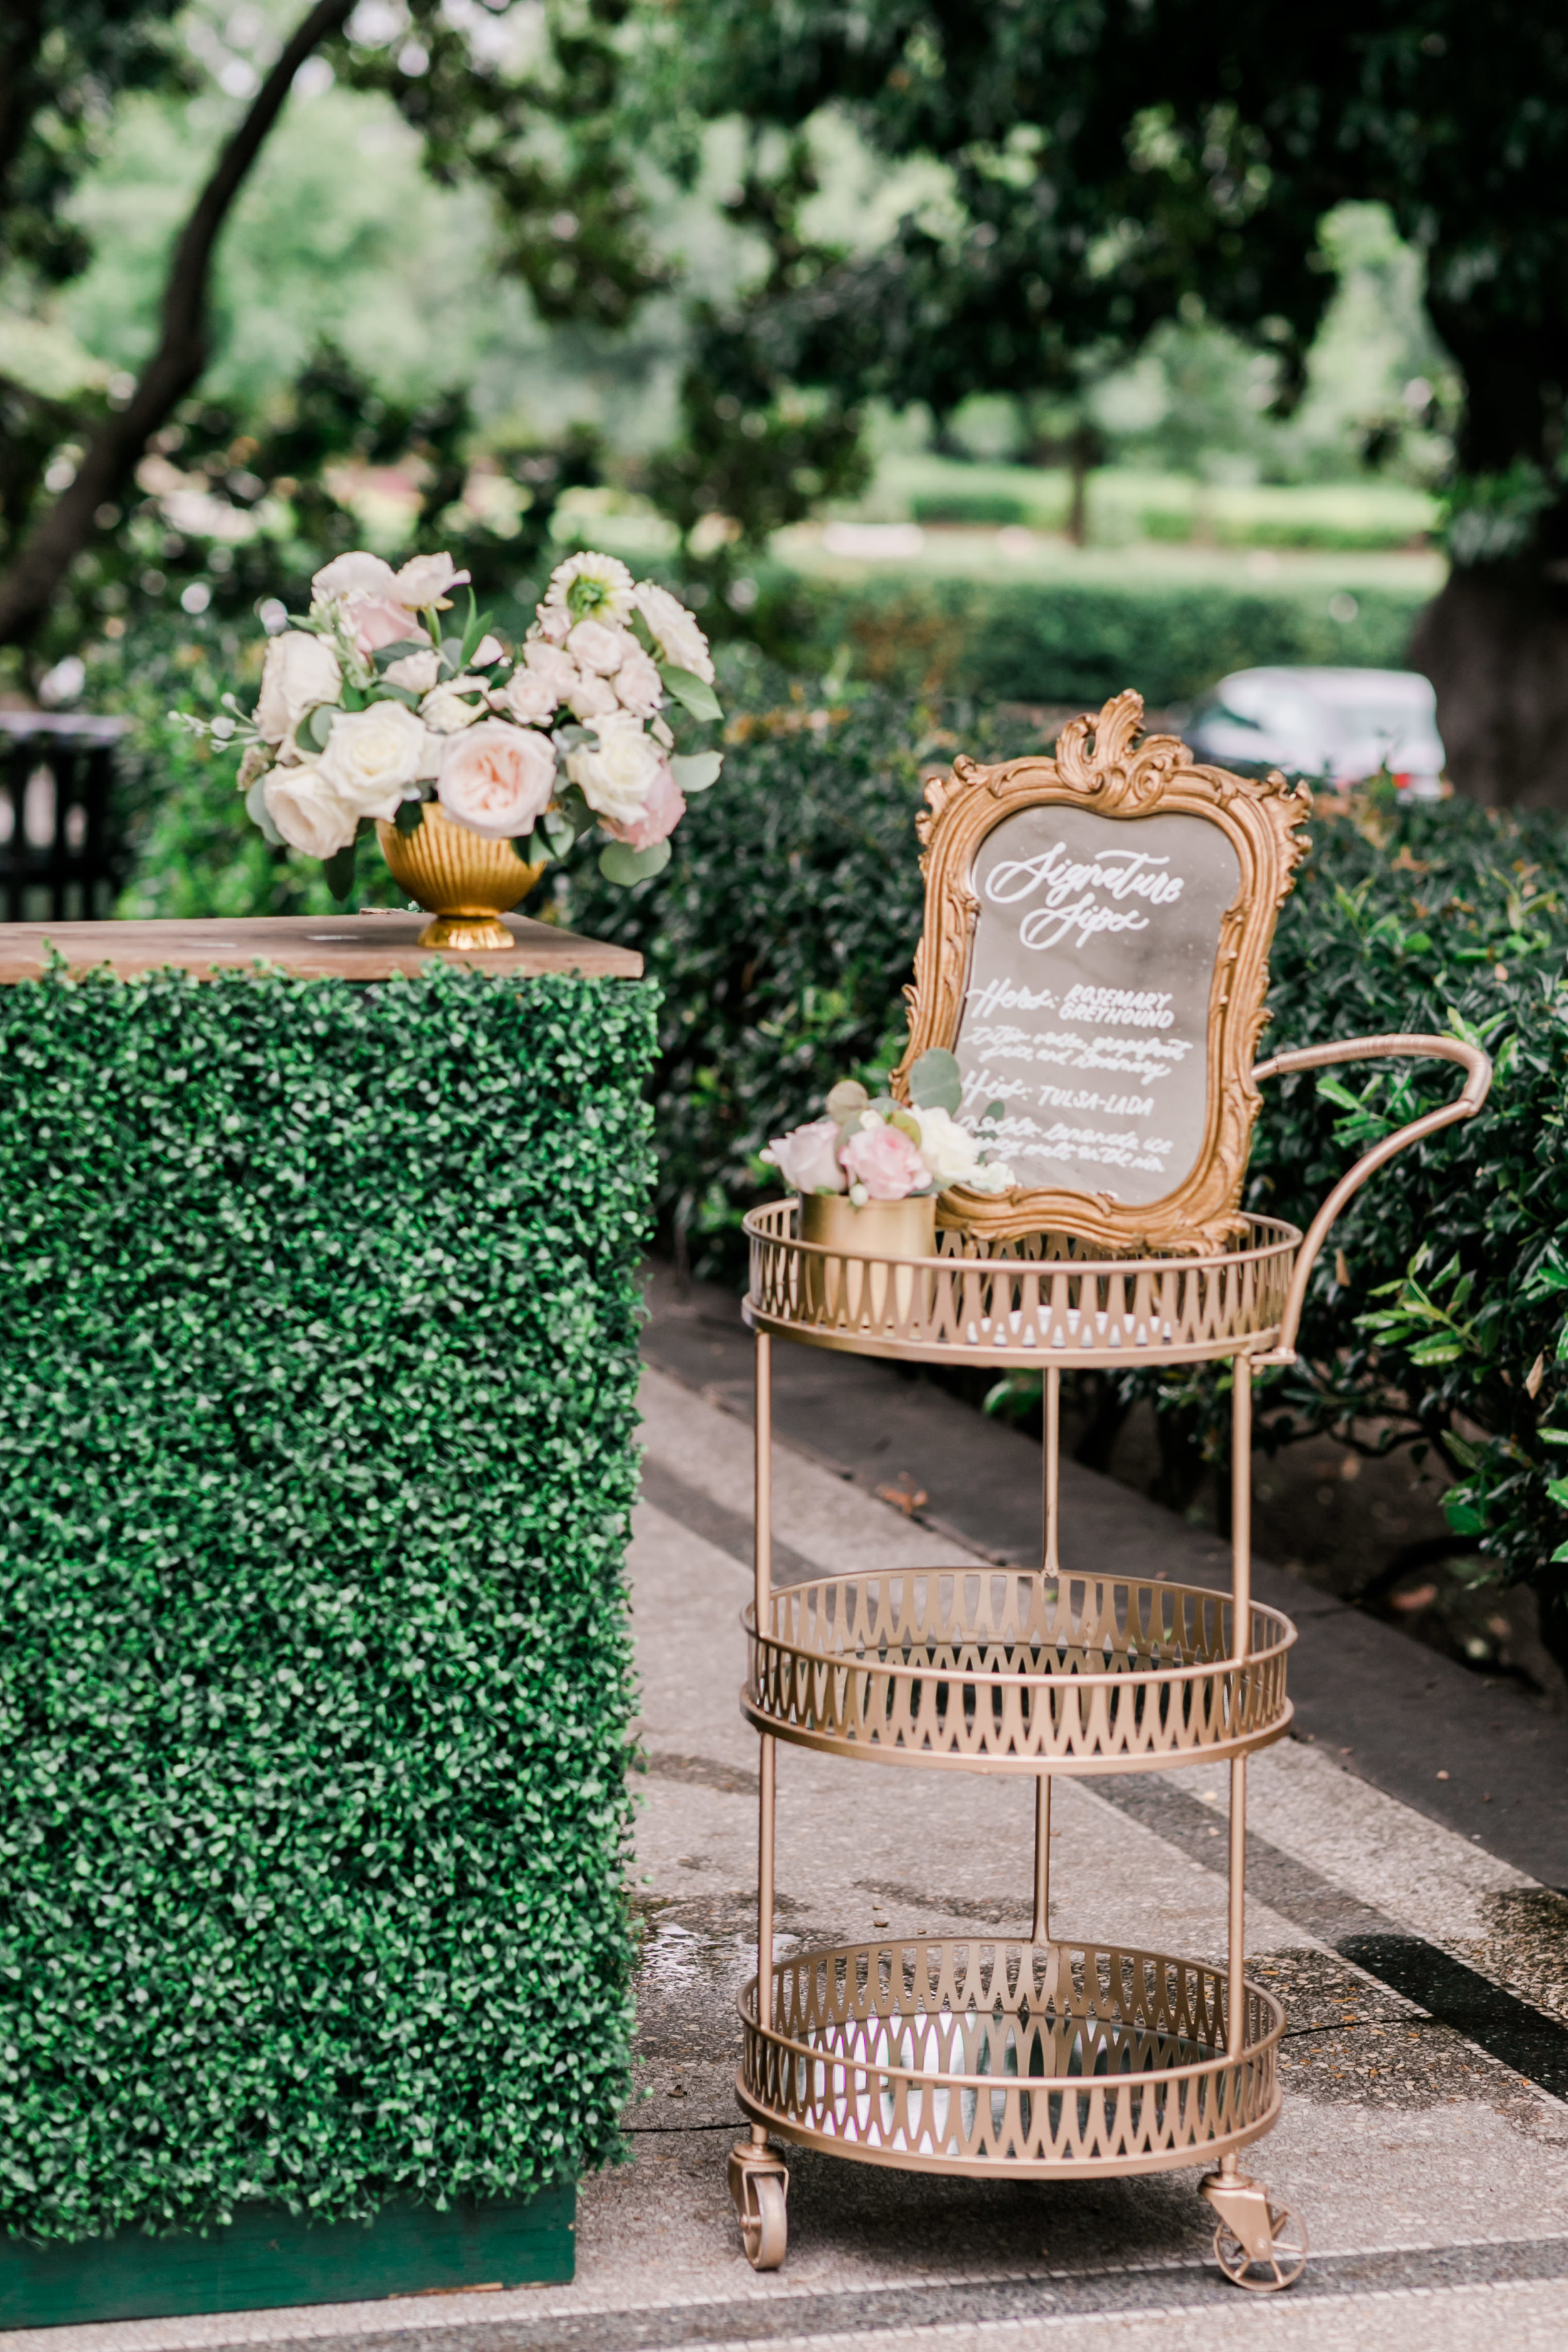 The Mansion at Woodward Park Tulsa Oklahoma Wedding_Valorie Darling Photography-0116.jpg